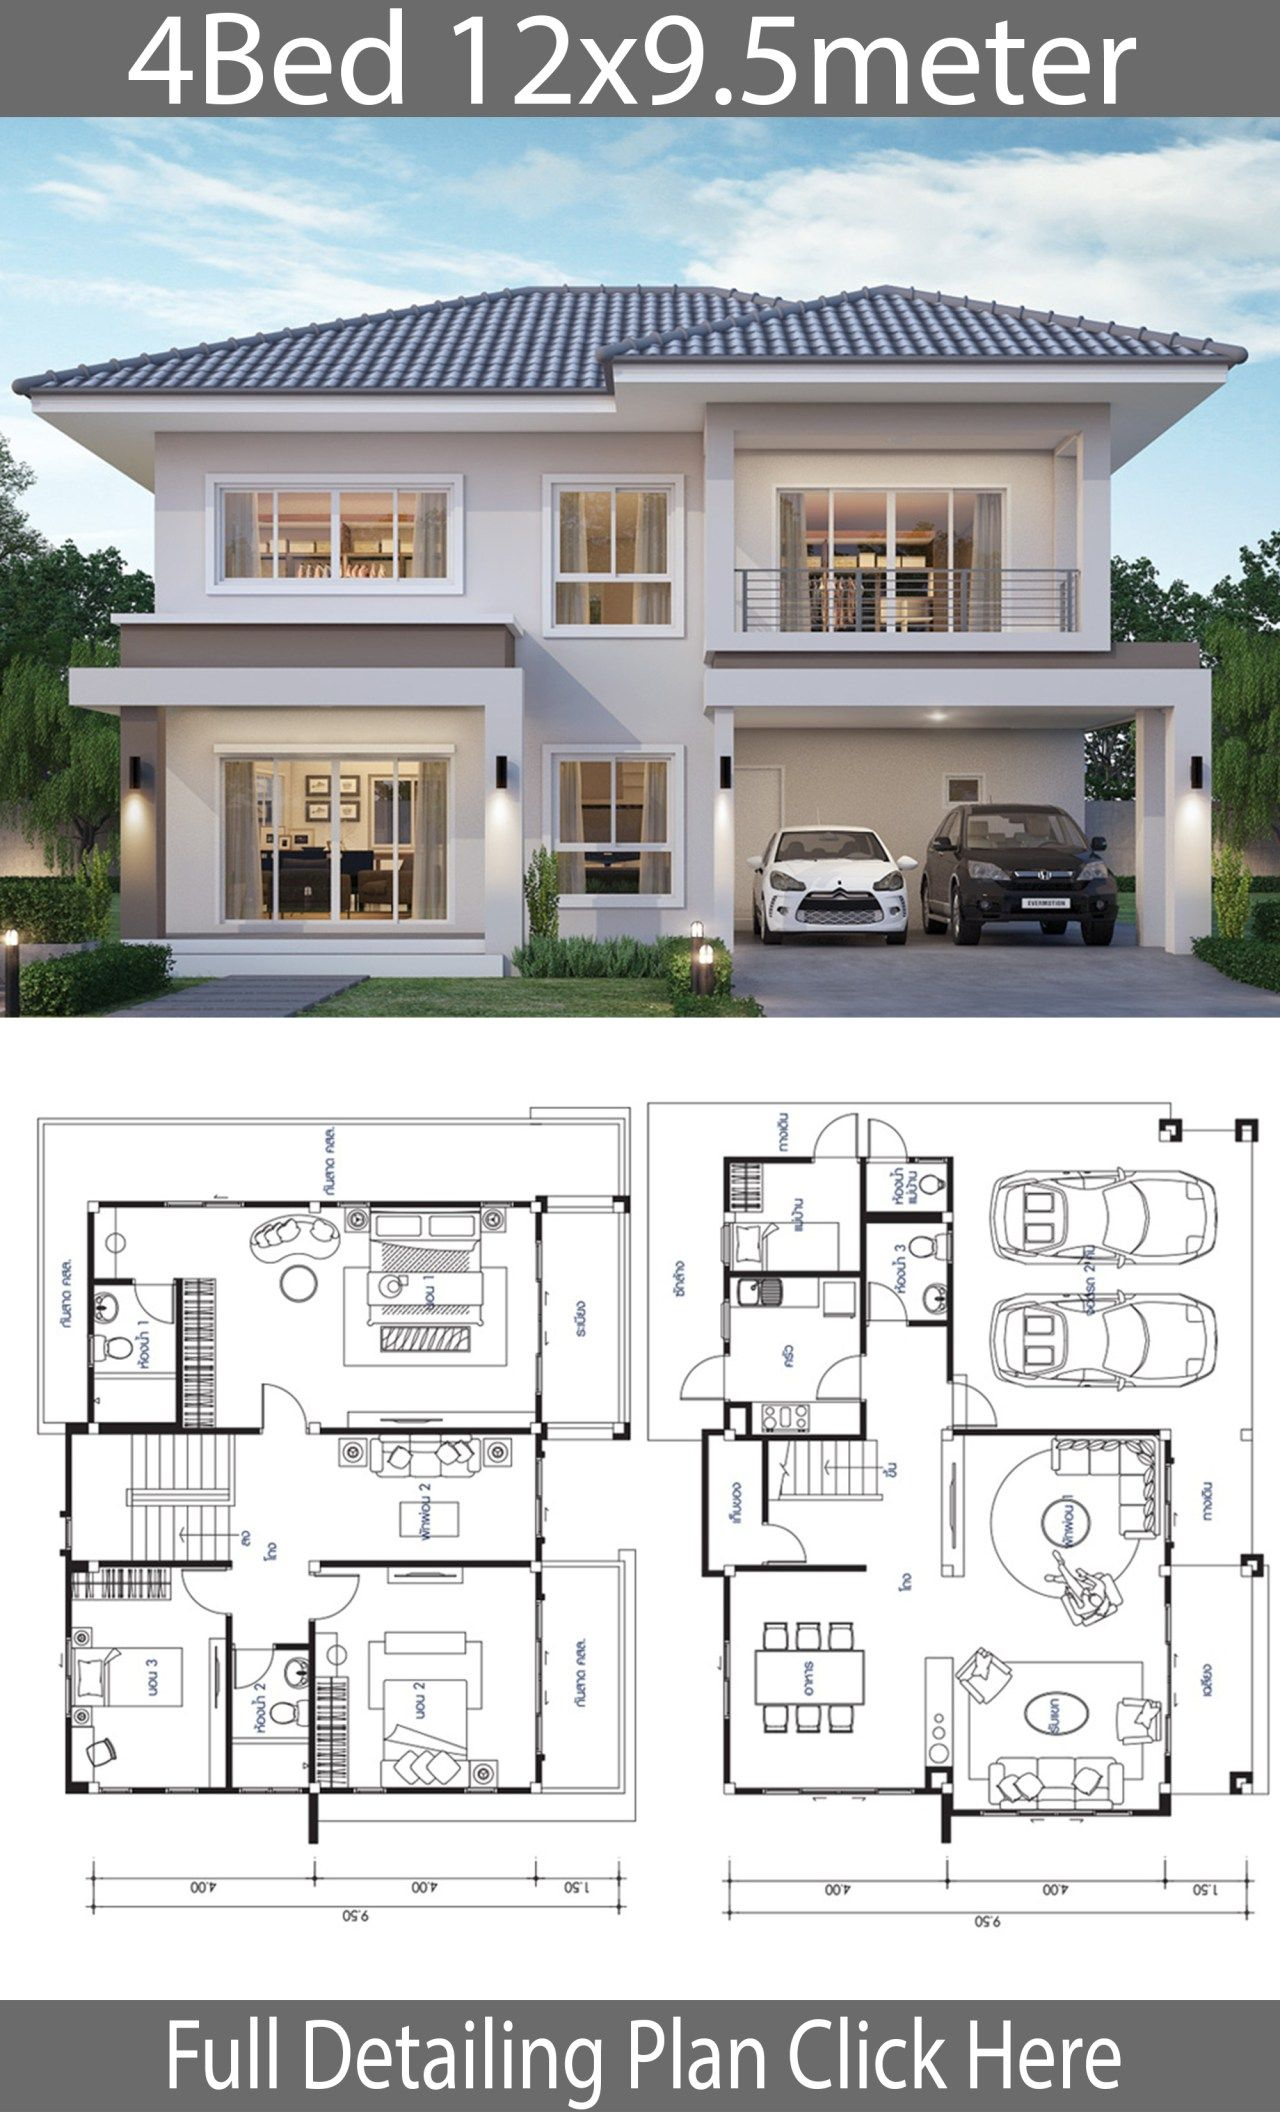 house design plan 12x9.5m with 4 bedrooms (dengan gambar